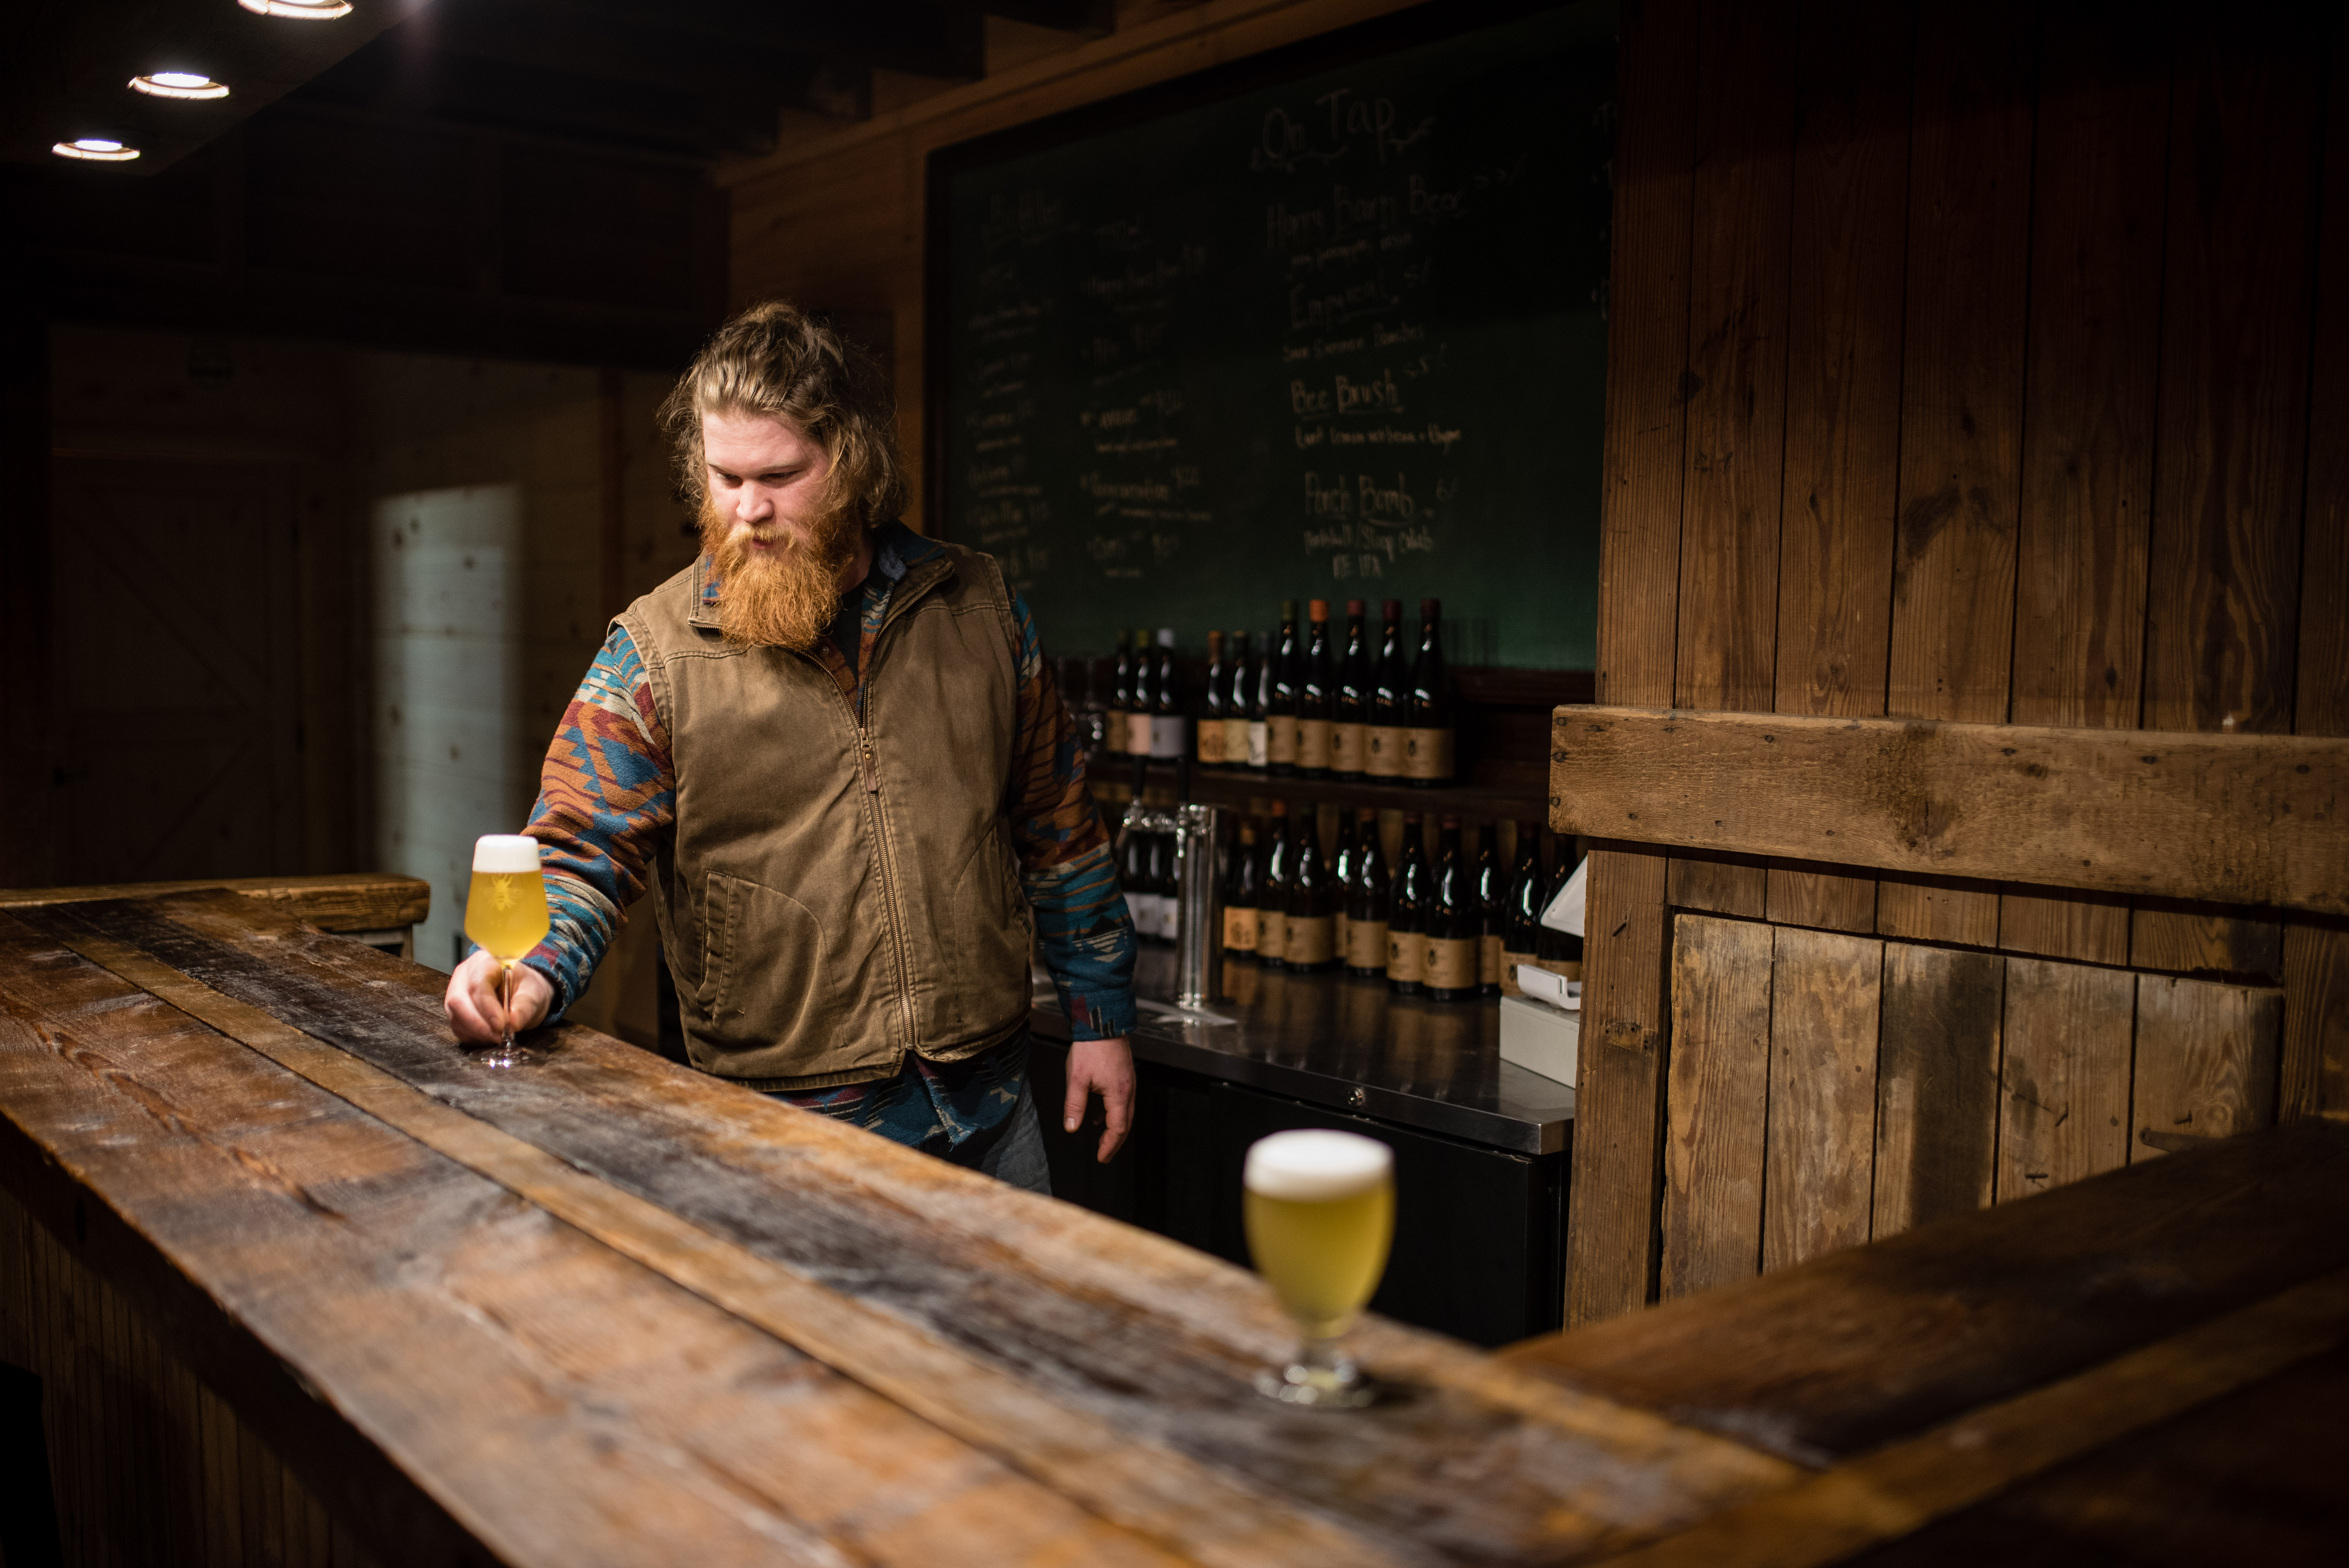 29 plan bee brewery photographed by derek dellinger